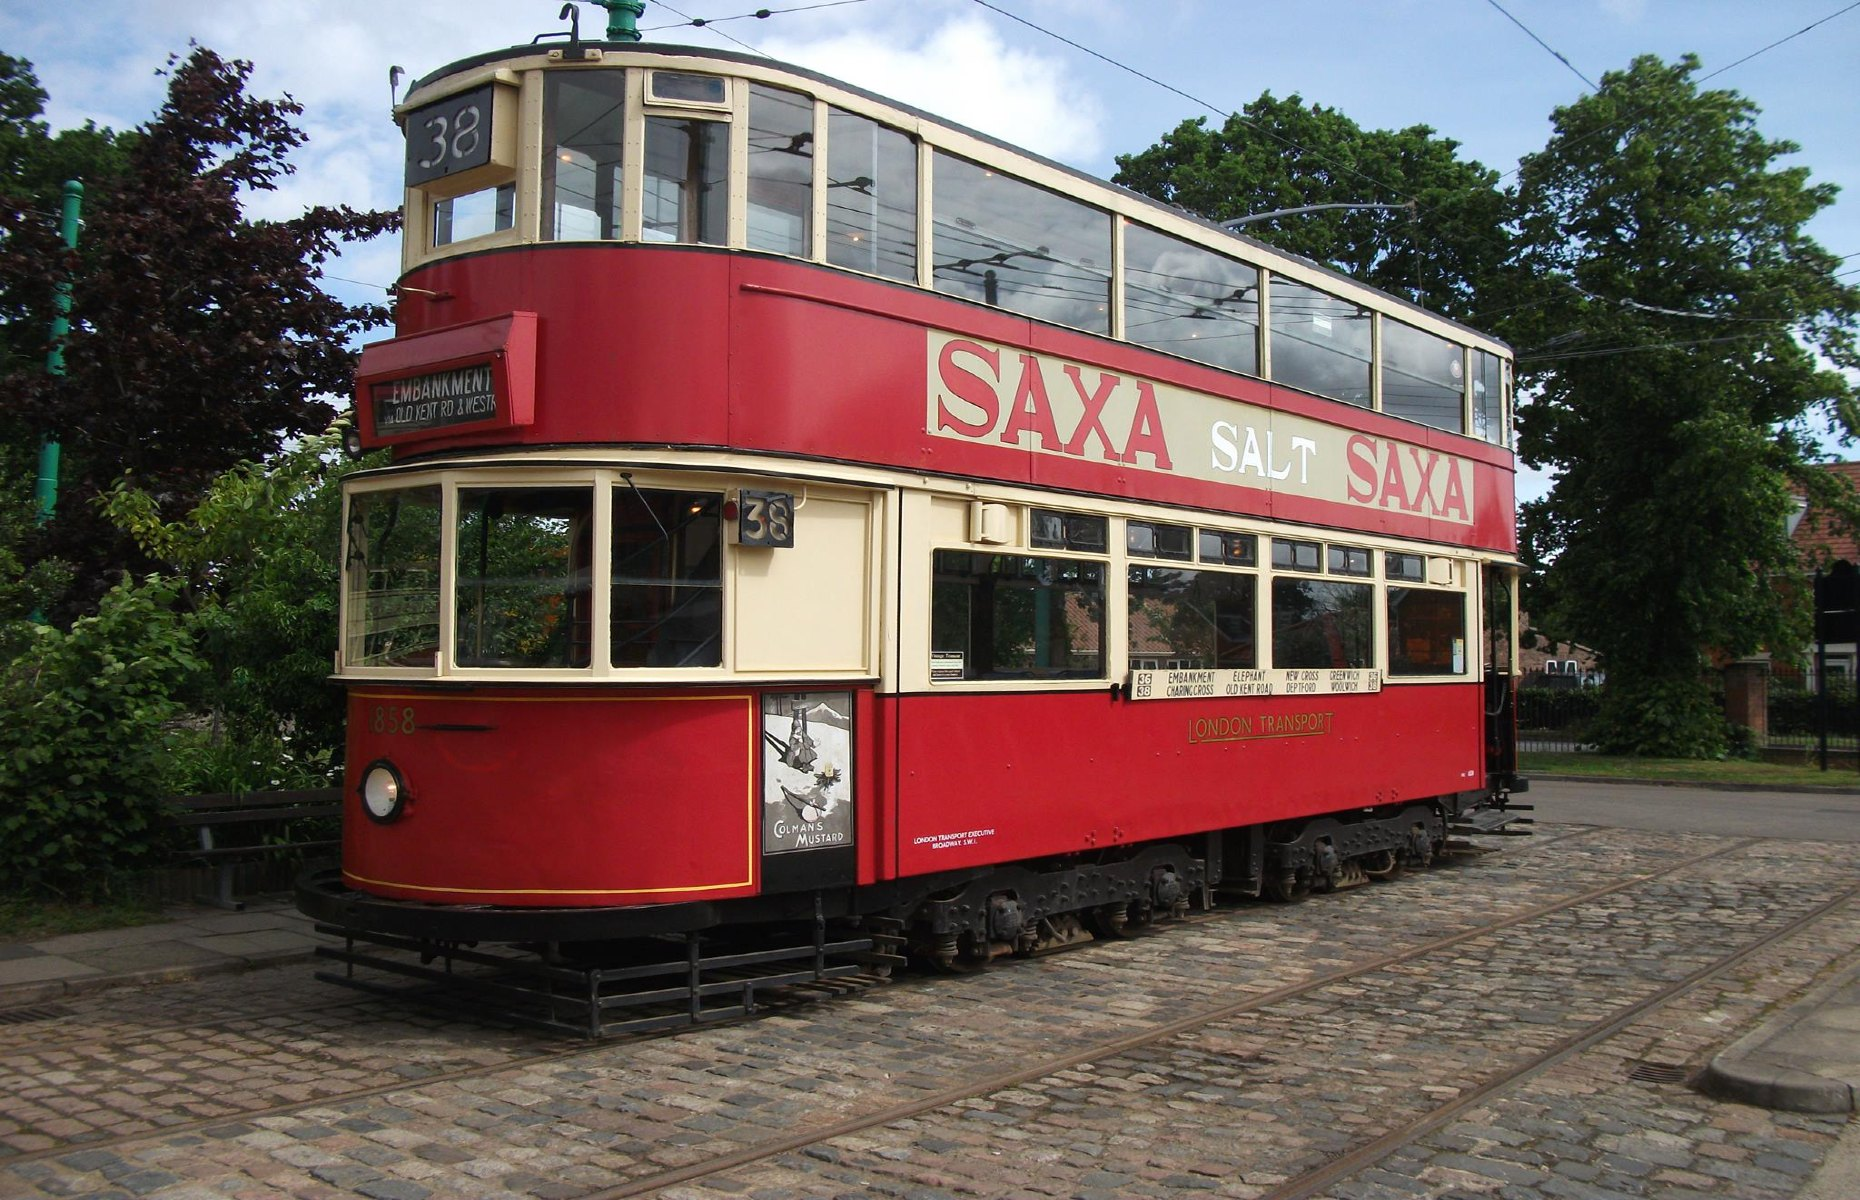 East Anglia Transport Museum (Image: East Anglia Transport Museum/Facebook)